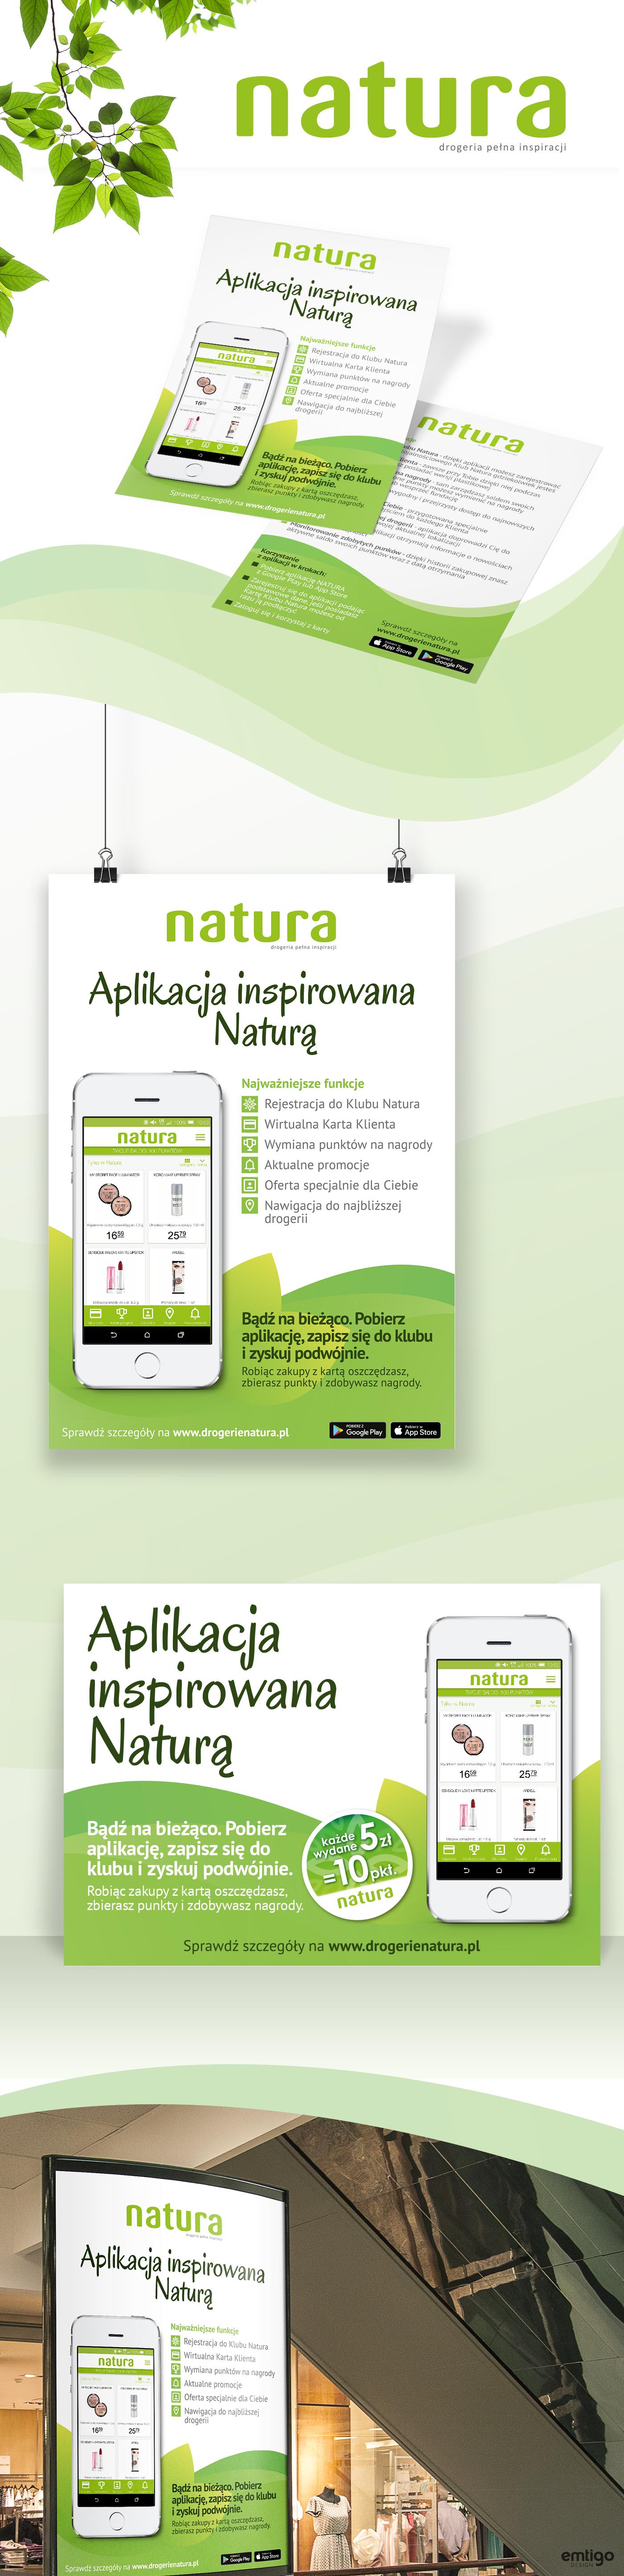 natura-aplikacja mobilna